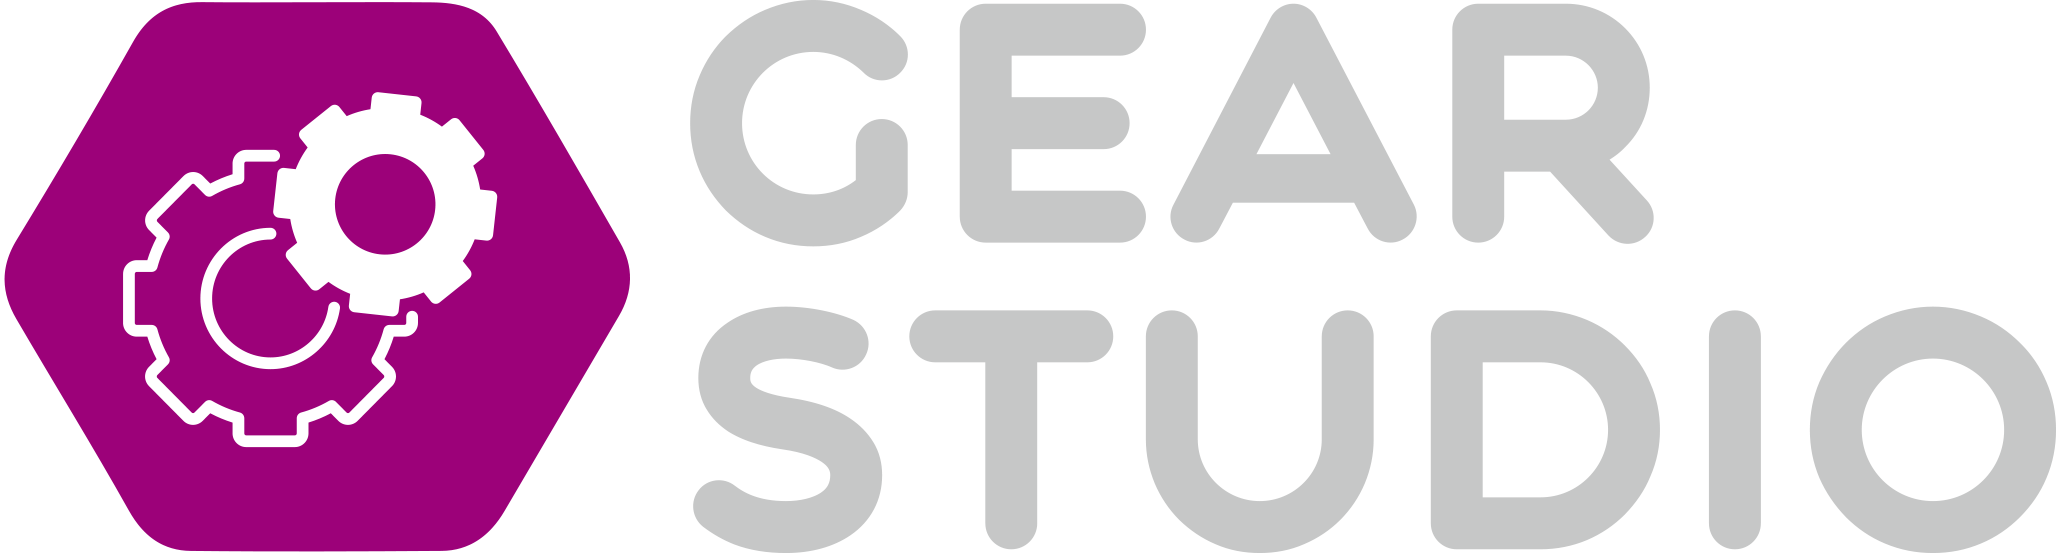 GearStudio logo purple cloud studio